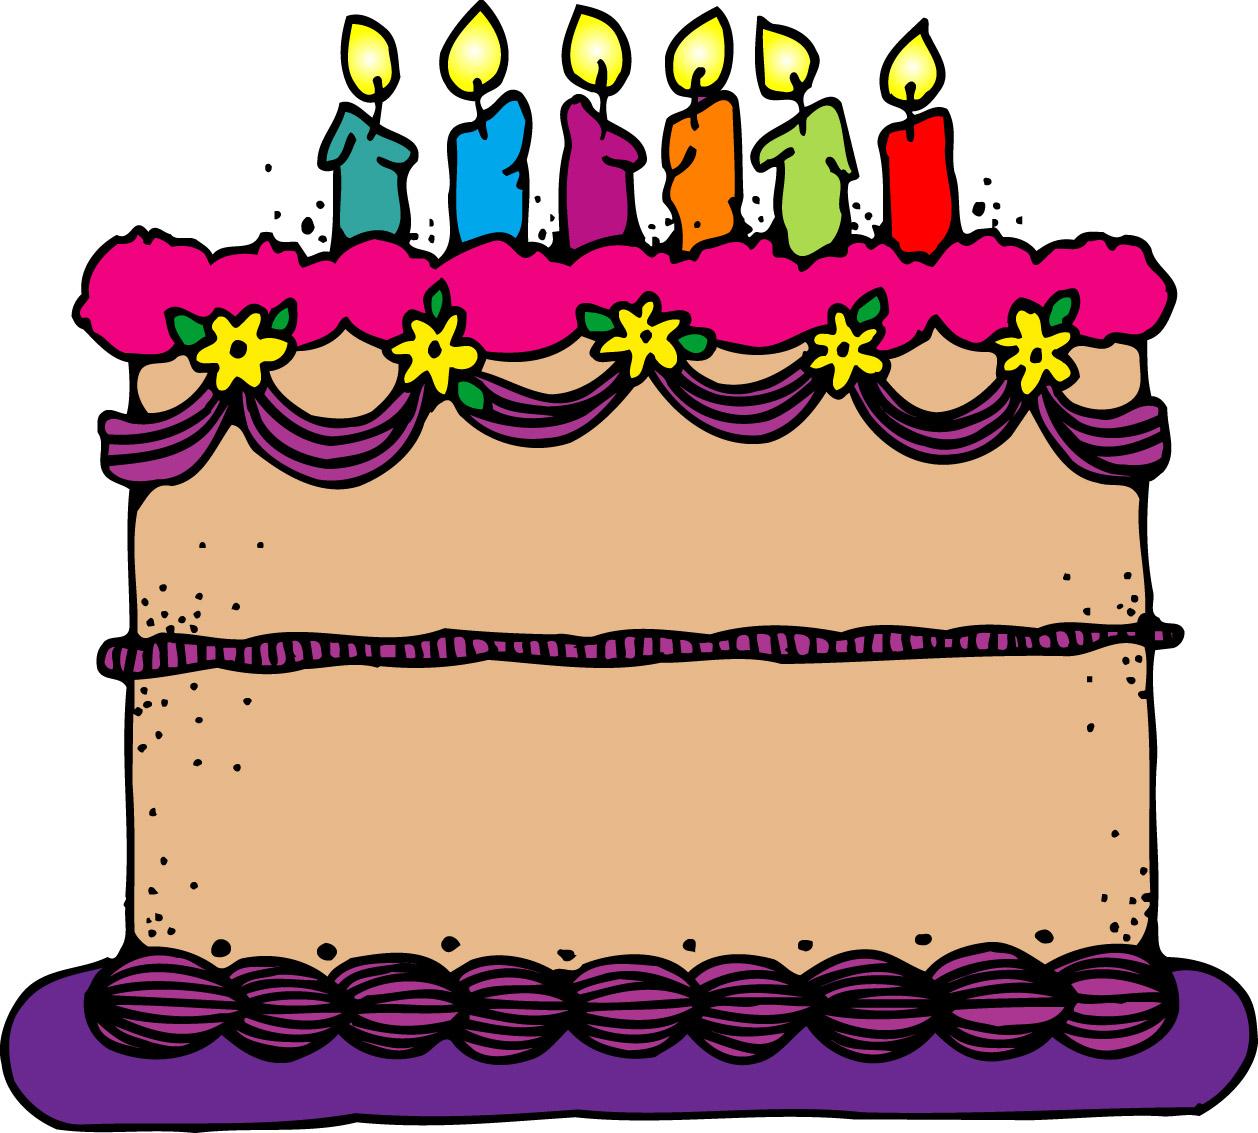 Birthday cake clip art free .-Birthday cake clip art free .-17